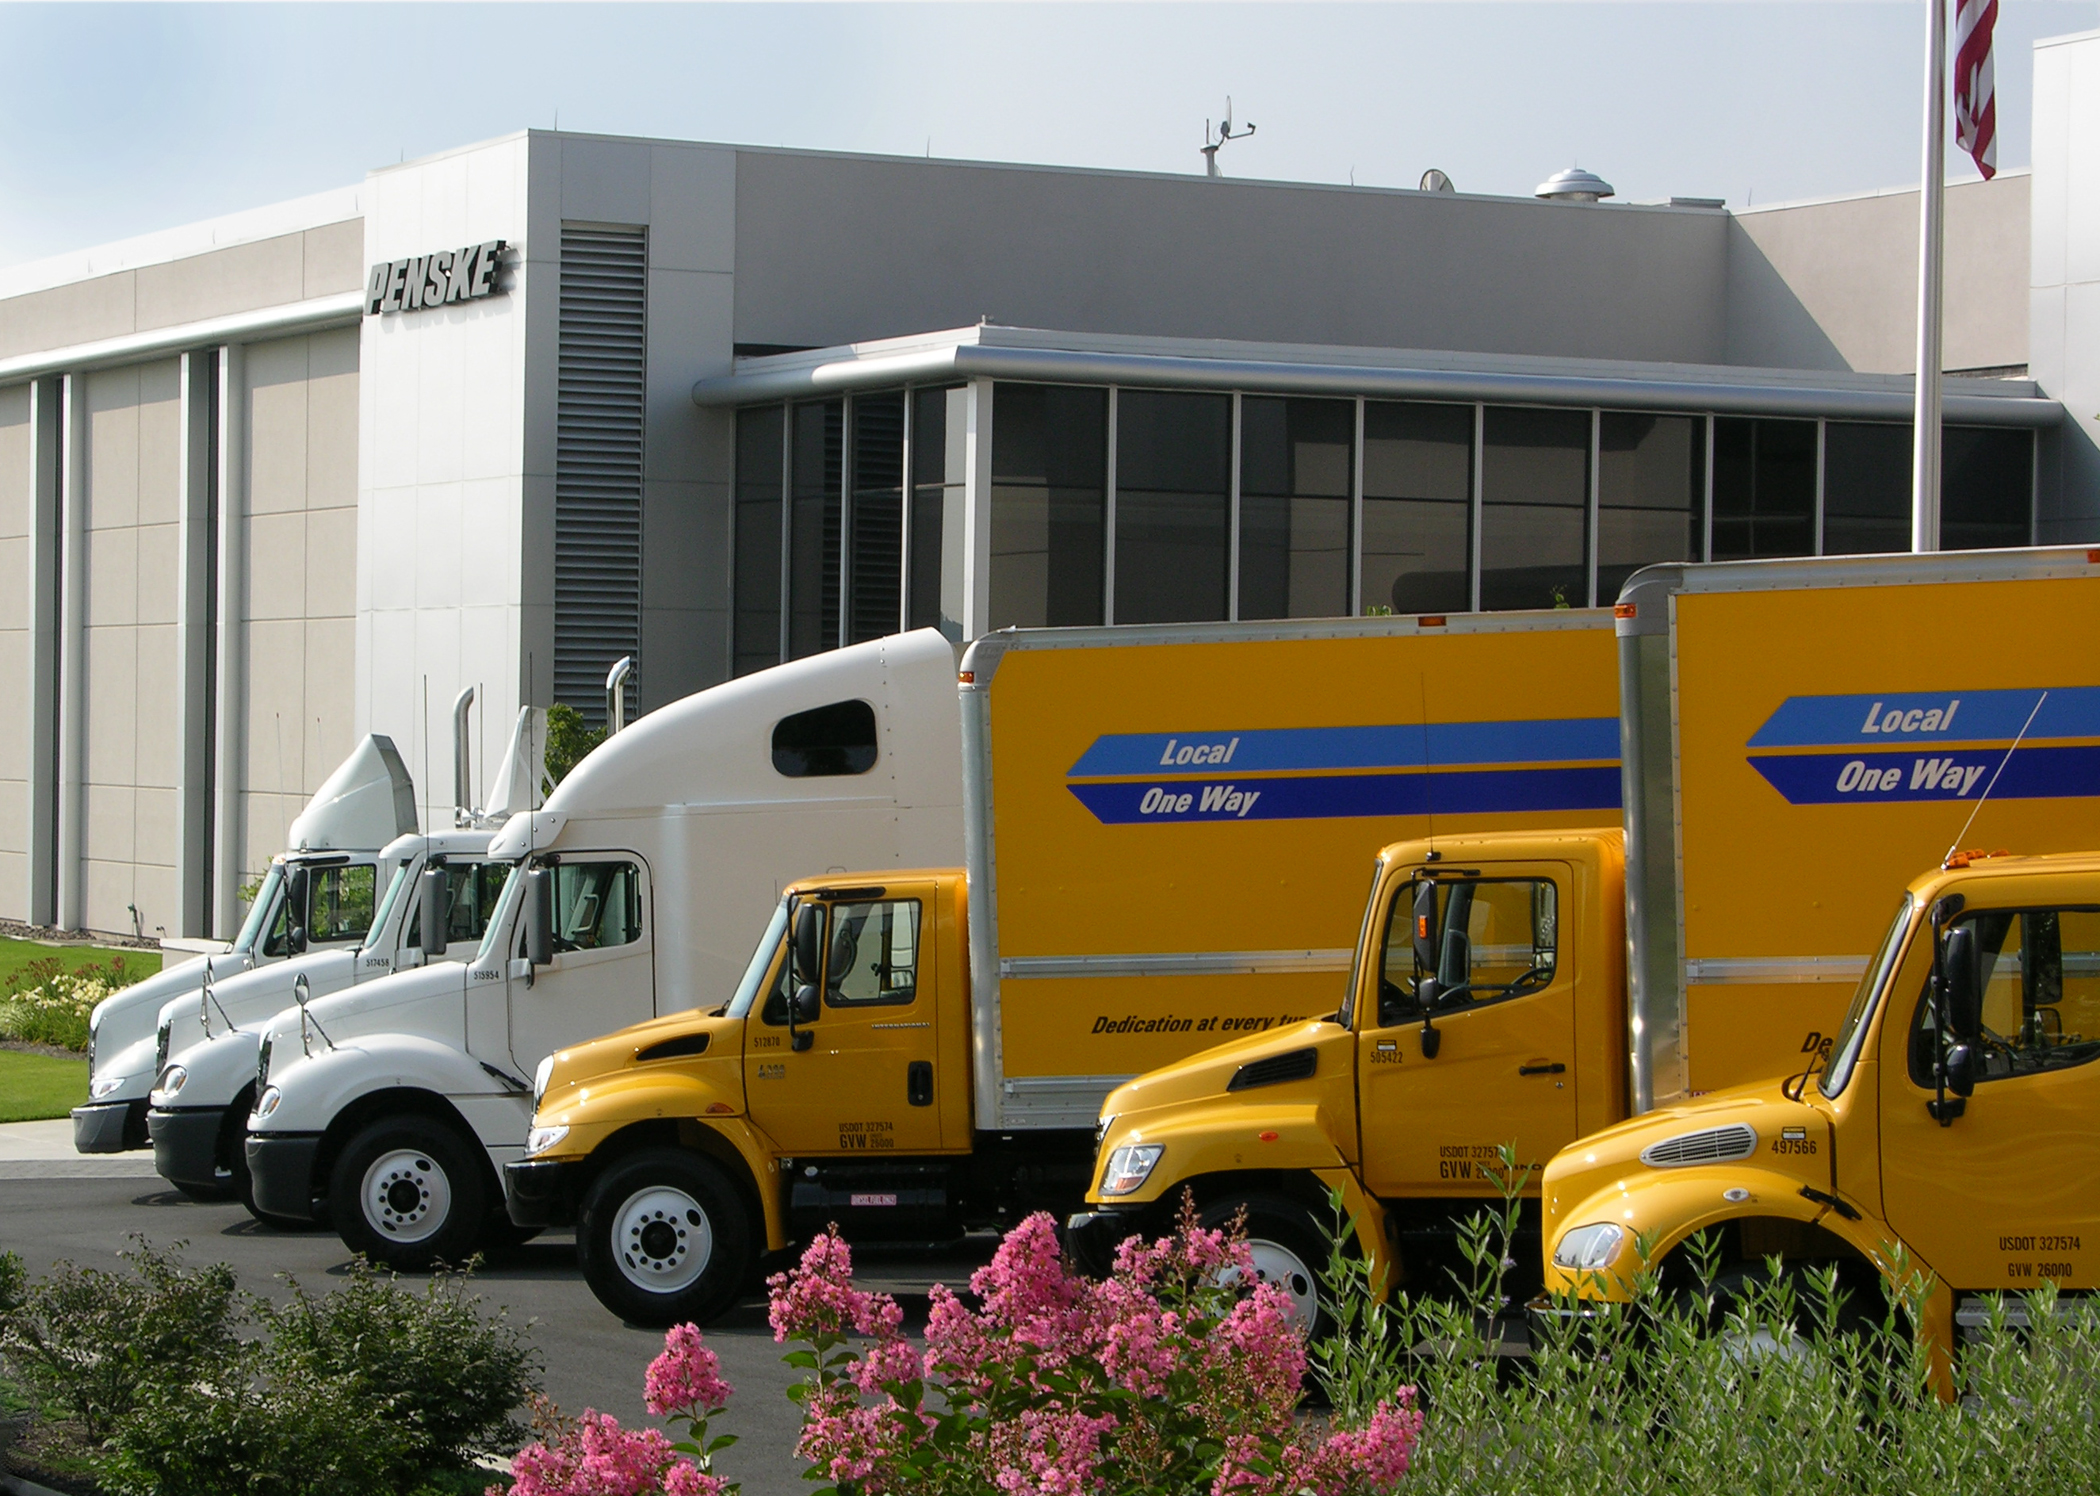 Alvernia University Penske Partnership Brings MBA Program to Penske